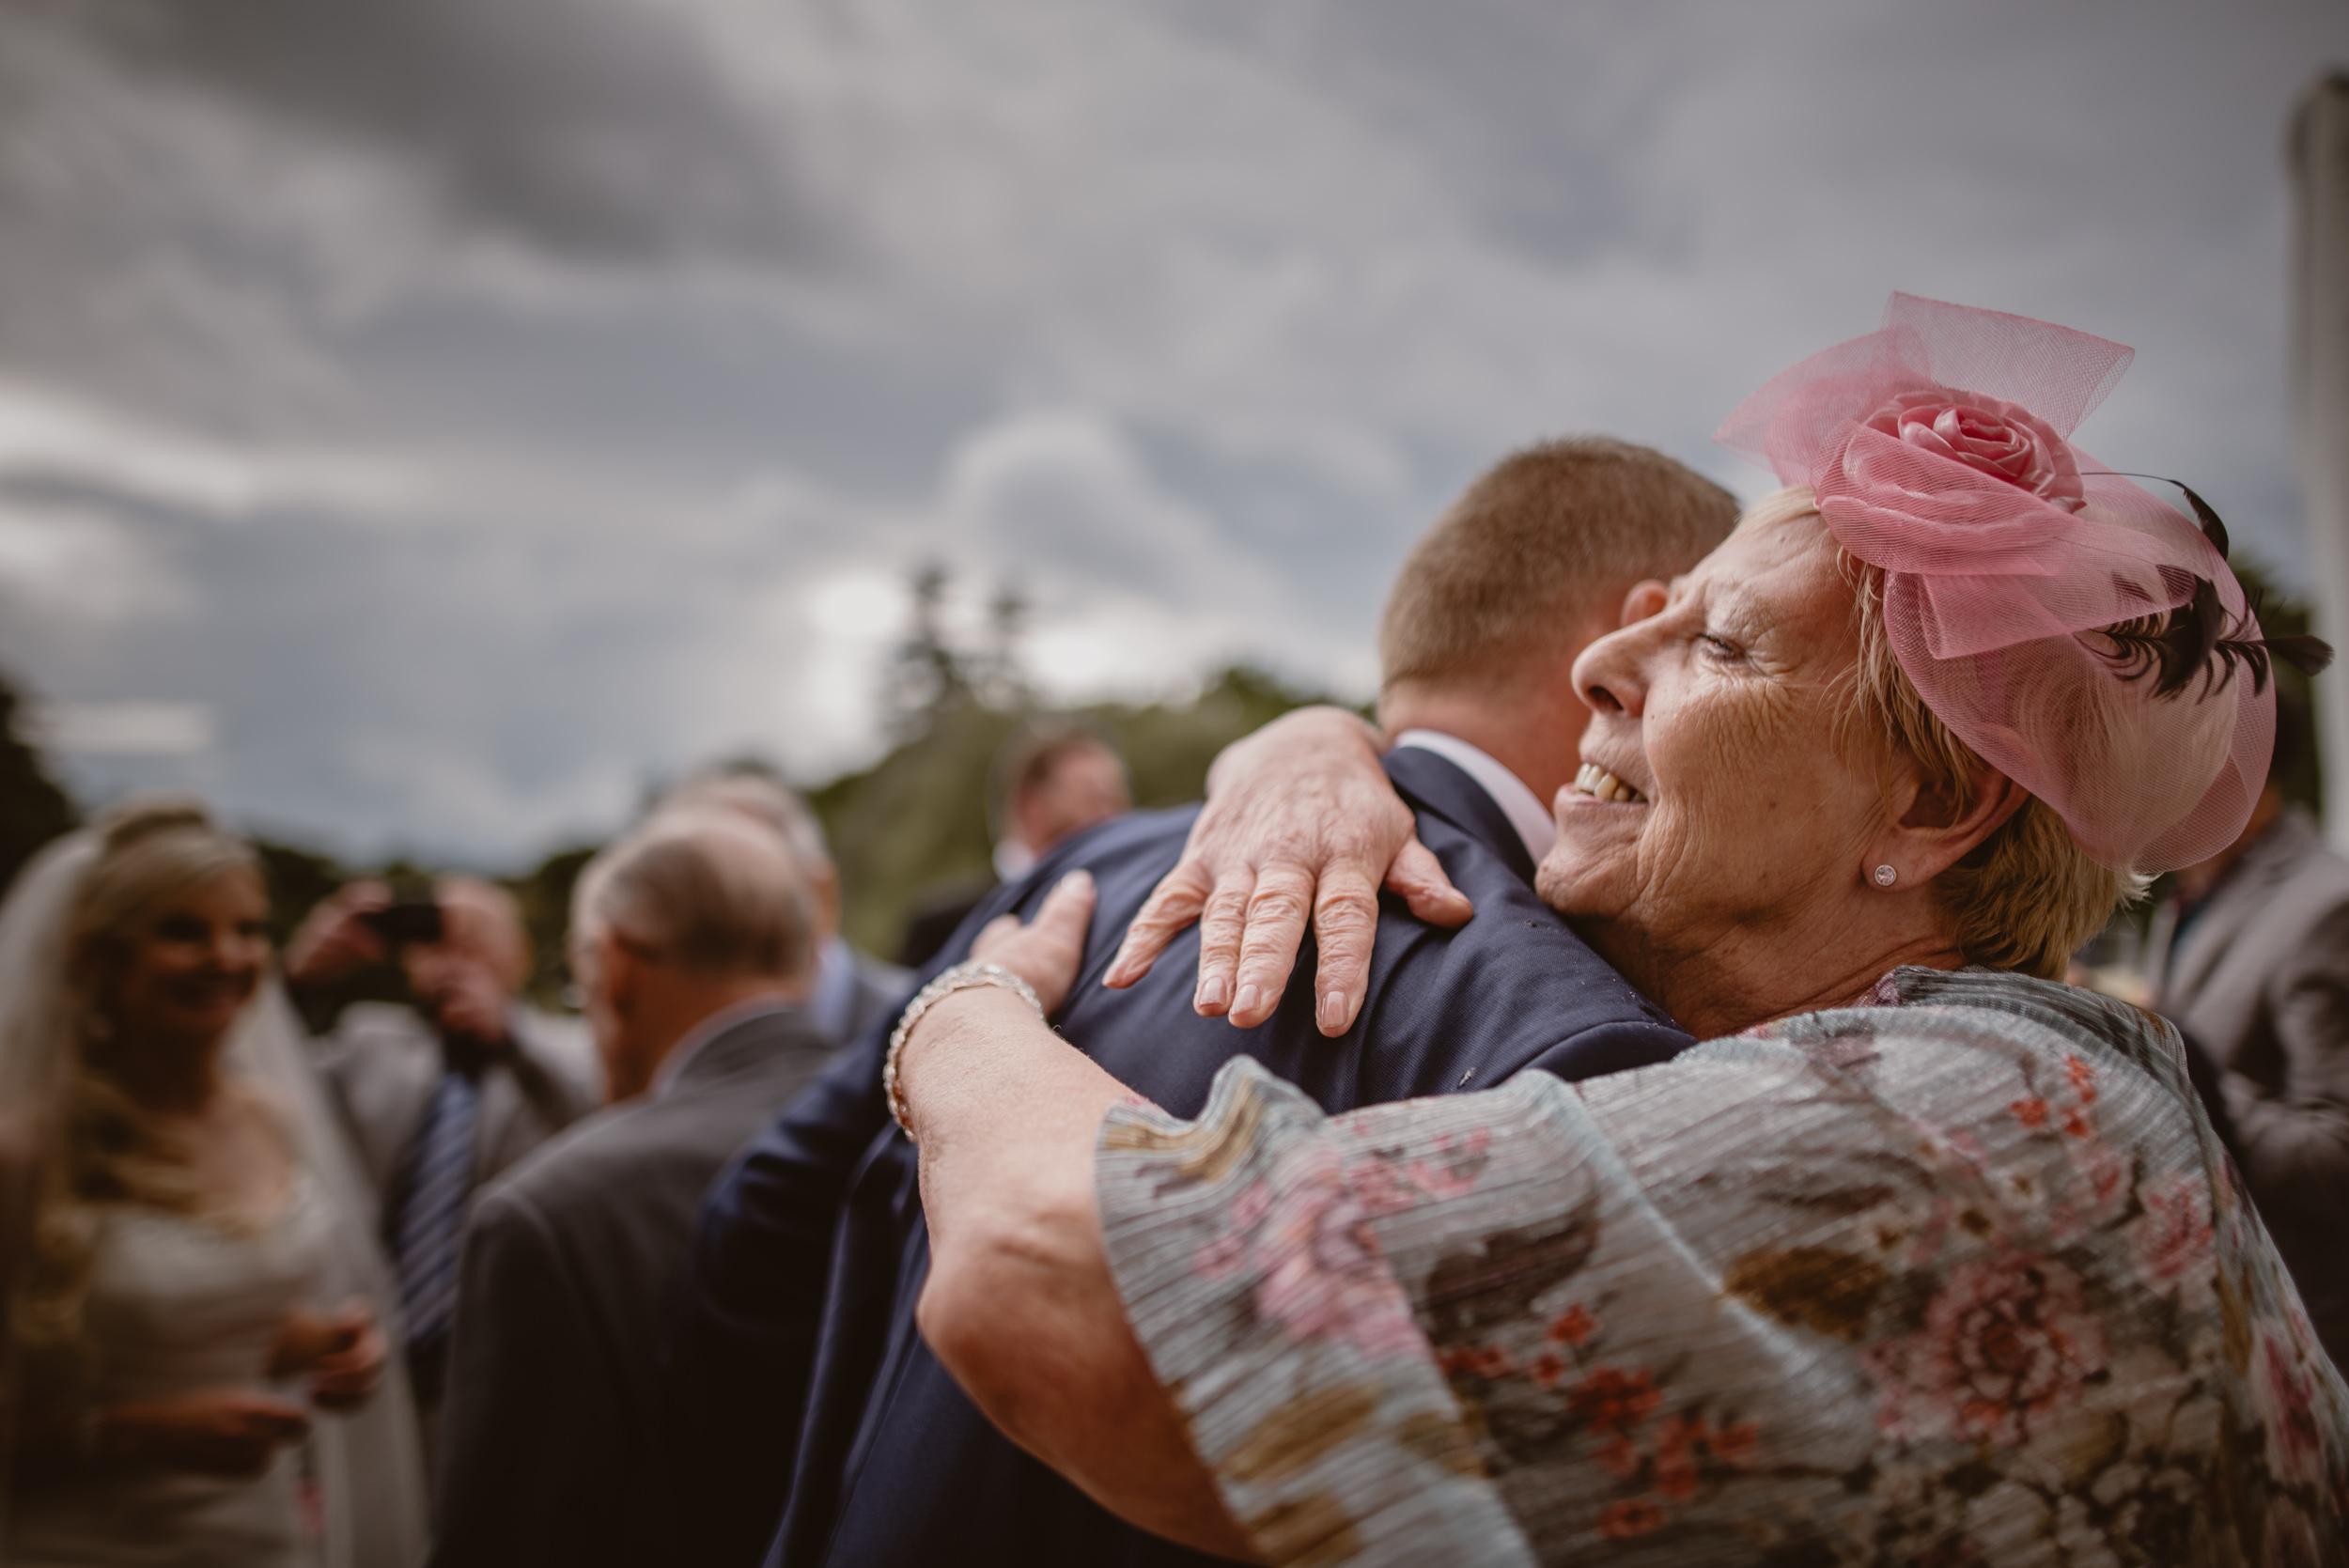 Trisha-and-Roger-wedding-The-Priory-Church-and-Chewton-Glen-Hotel-Christchurch-Manu-Mendoza-Wedding-Photography-346.jpg